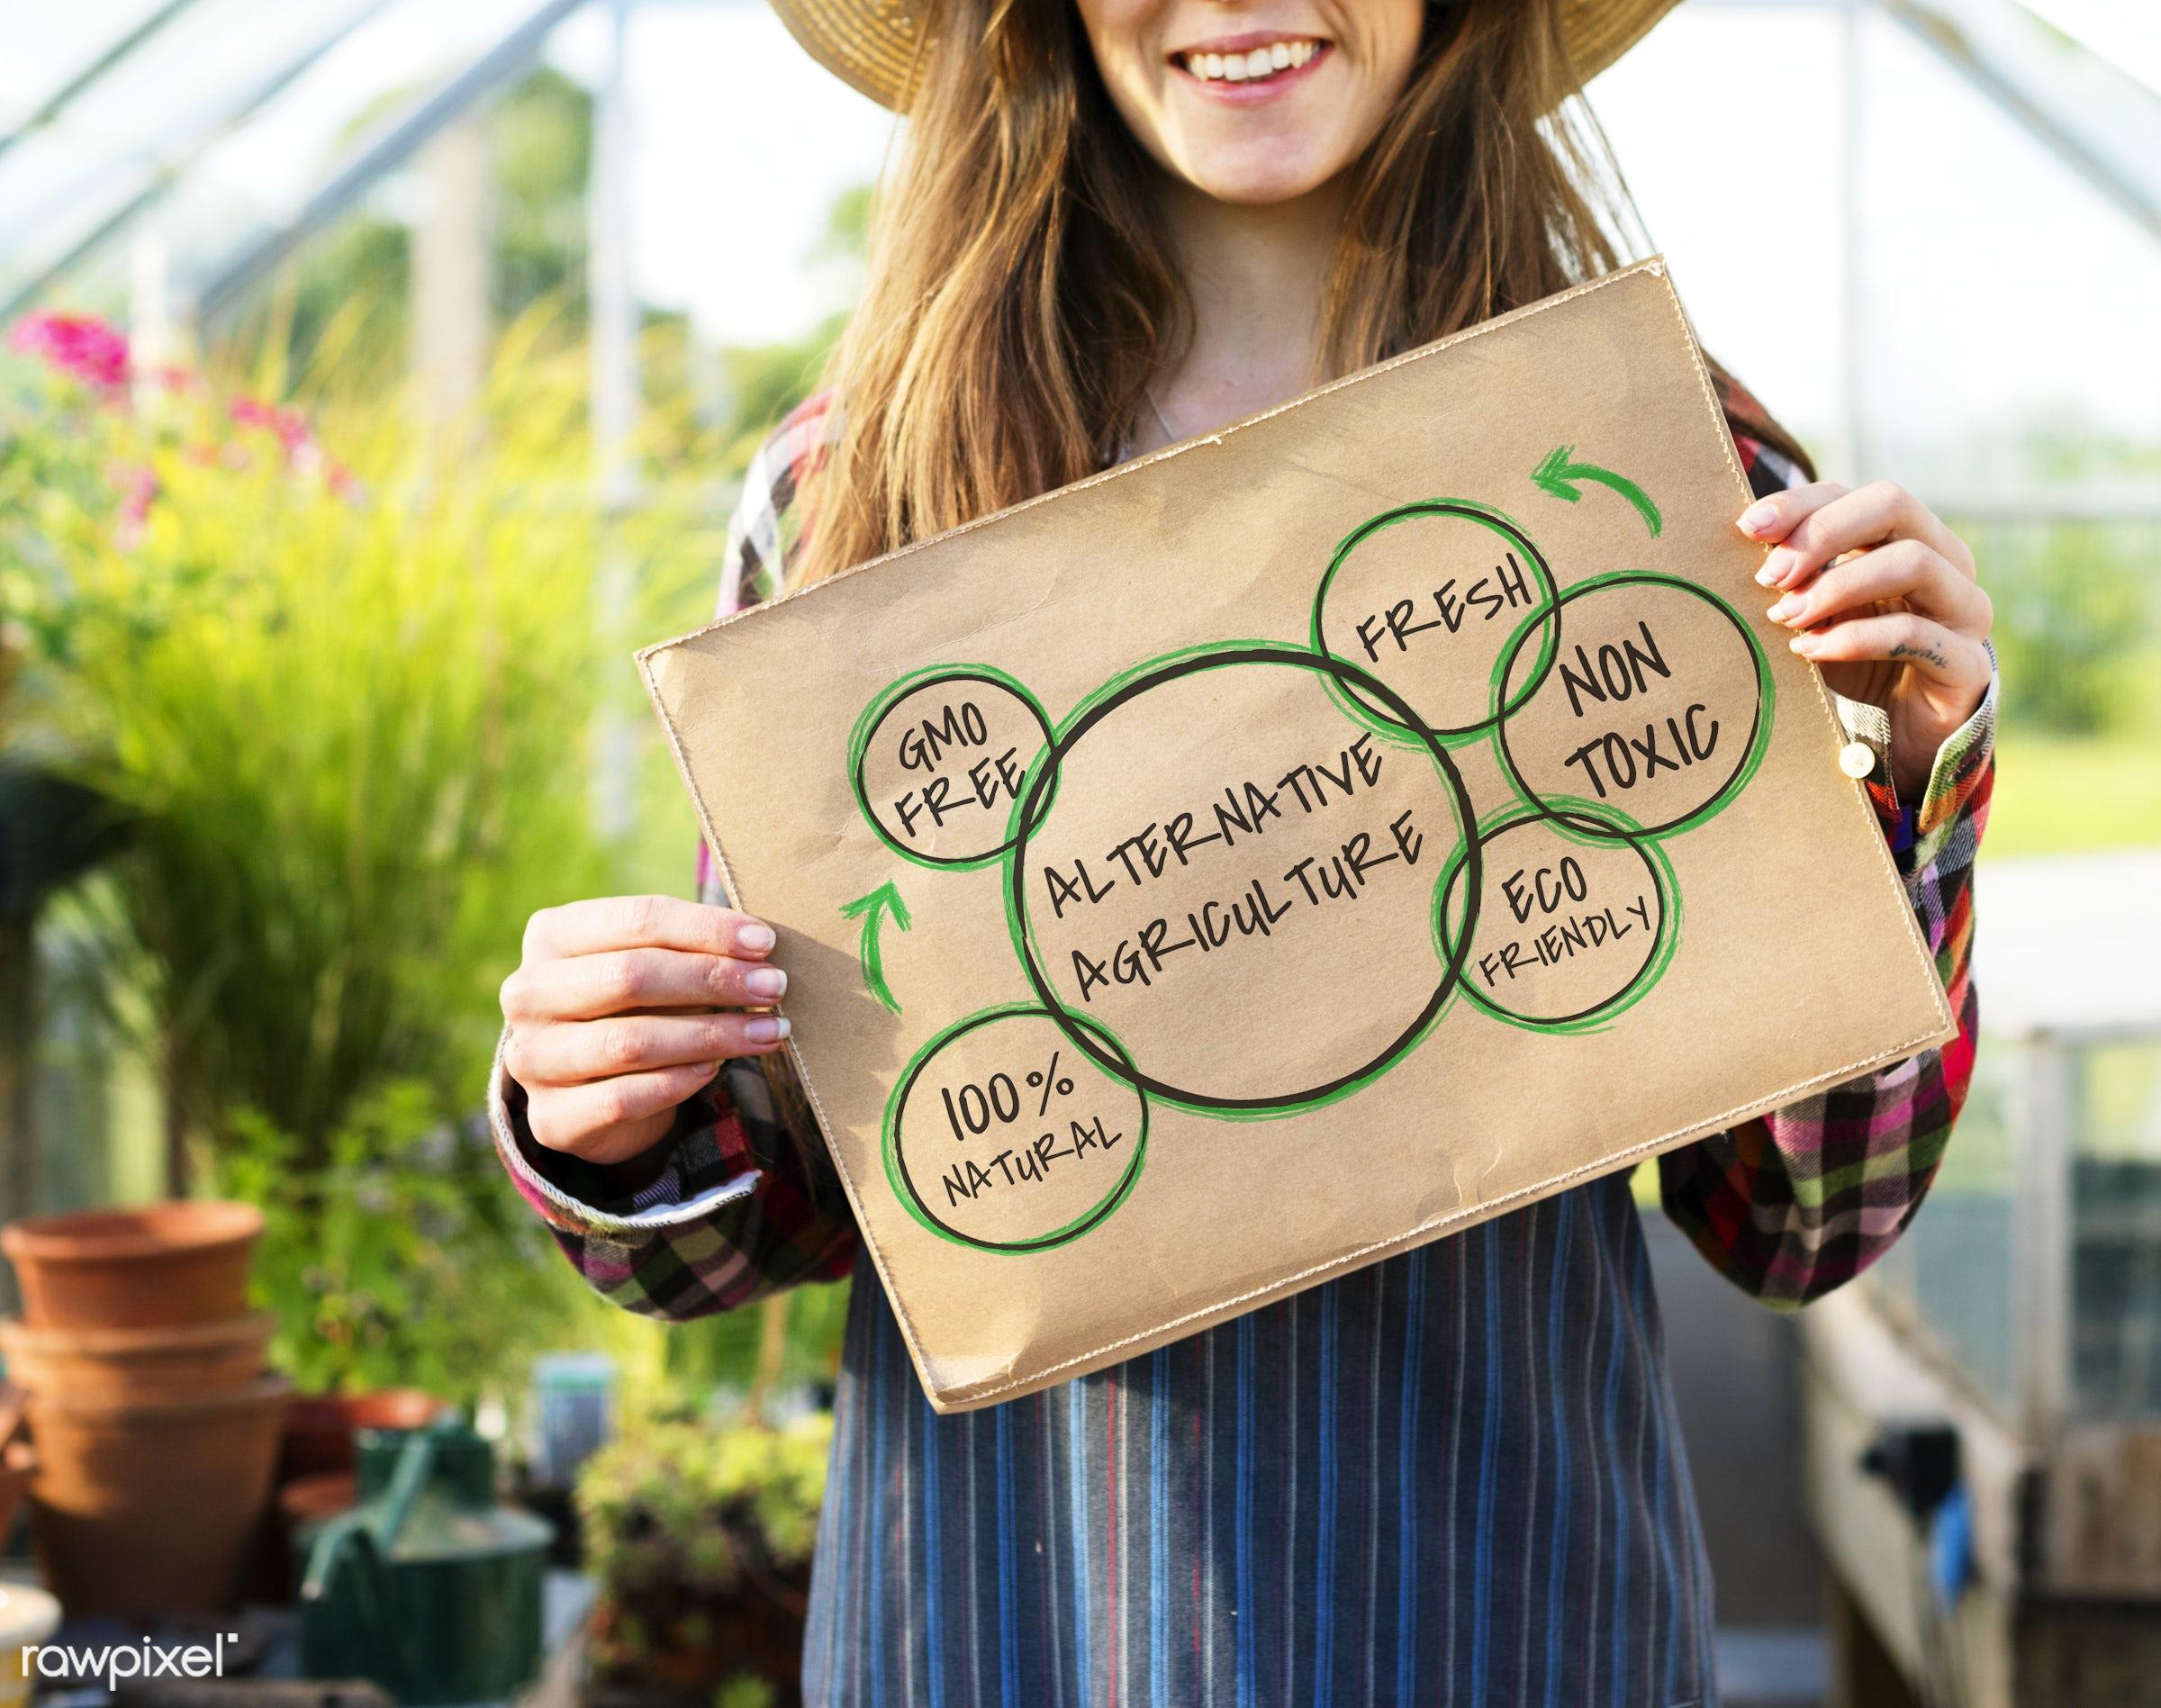 100% natural, adult, agriculture, alternative agriculture, alternative farming, caucasian, circle, countryside, dark blonde...